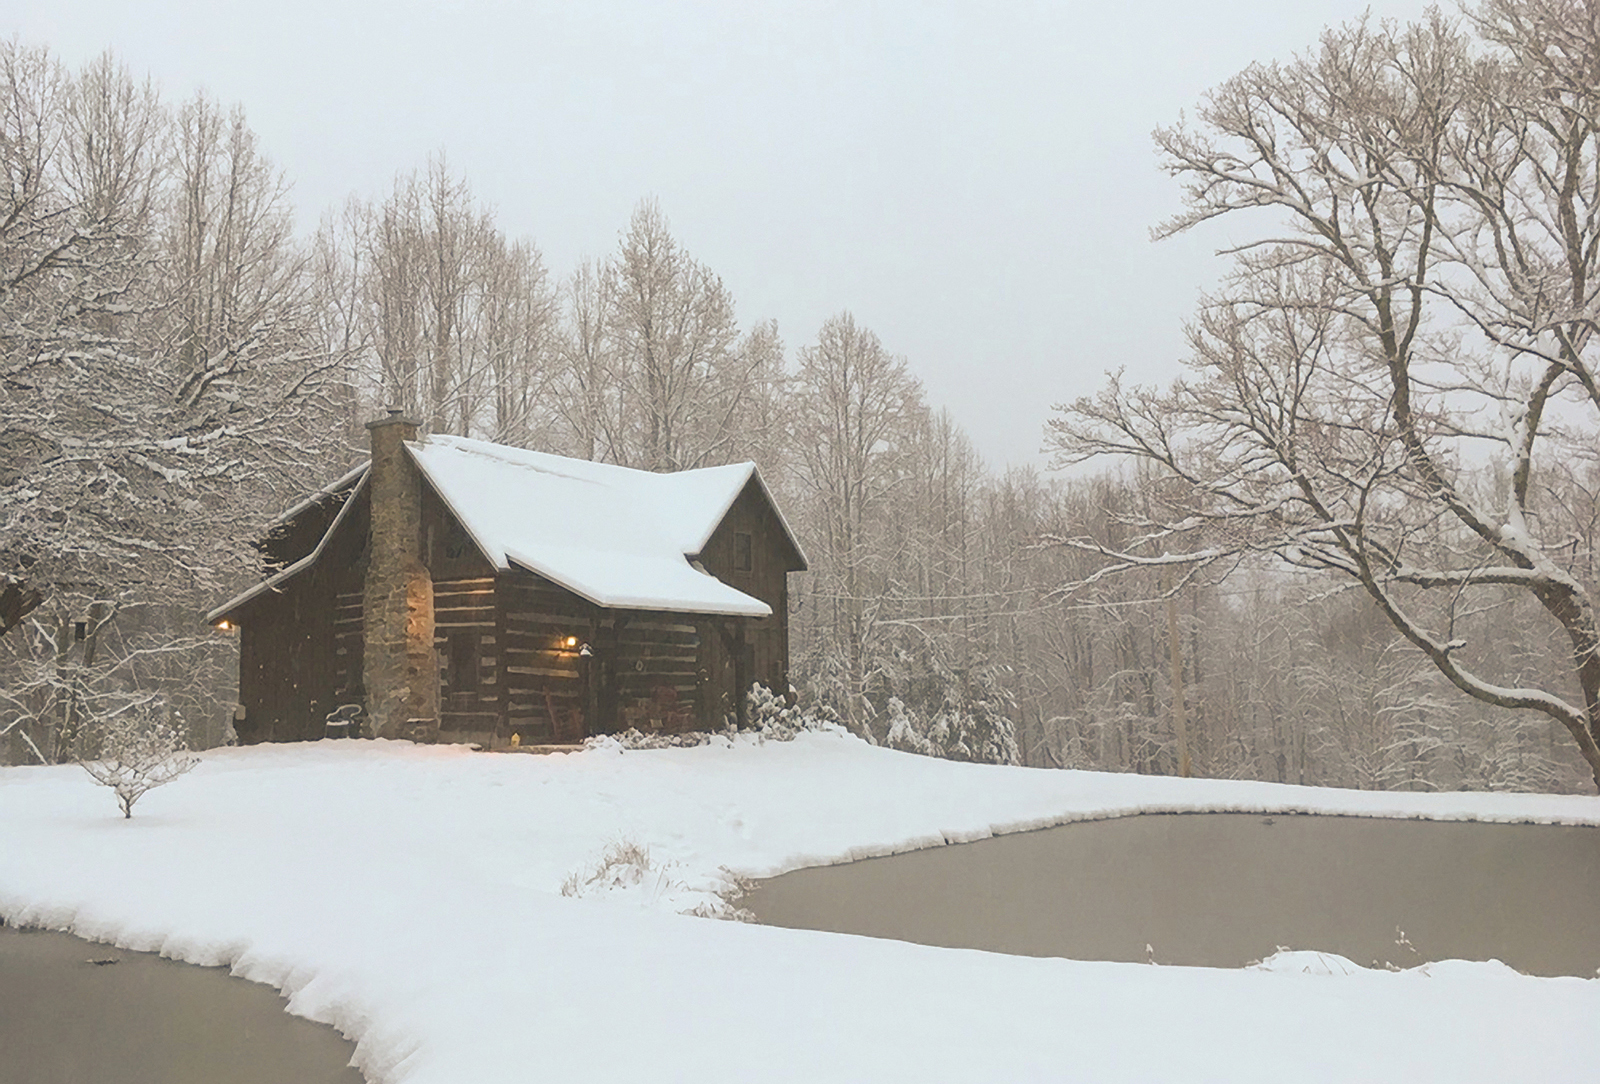 Leah-Singleton-cabin-in-the-winter-photo-contest